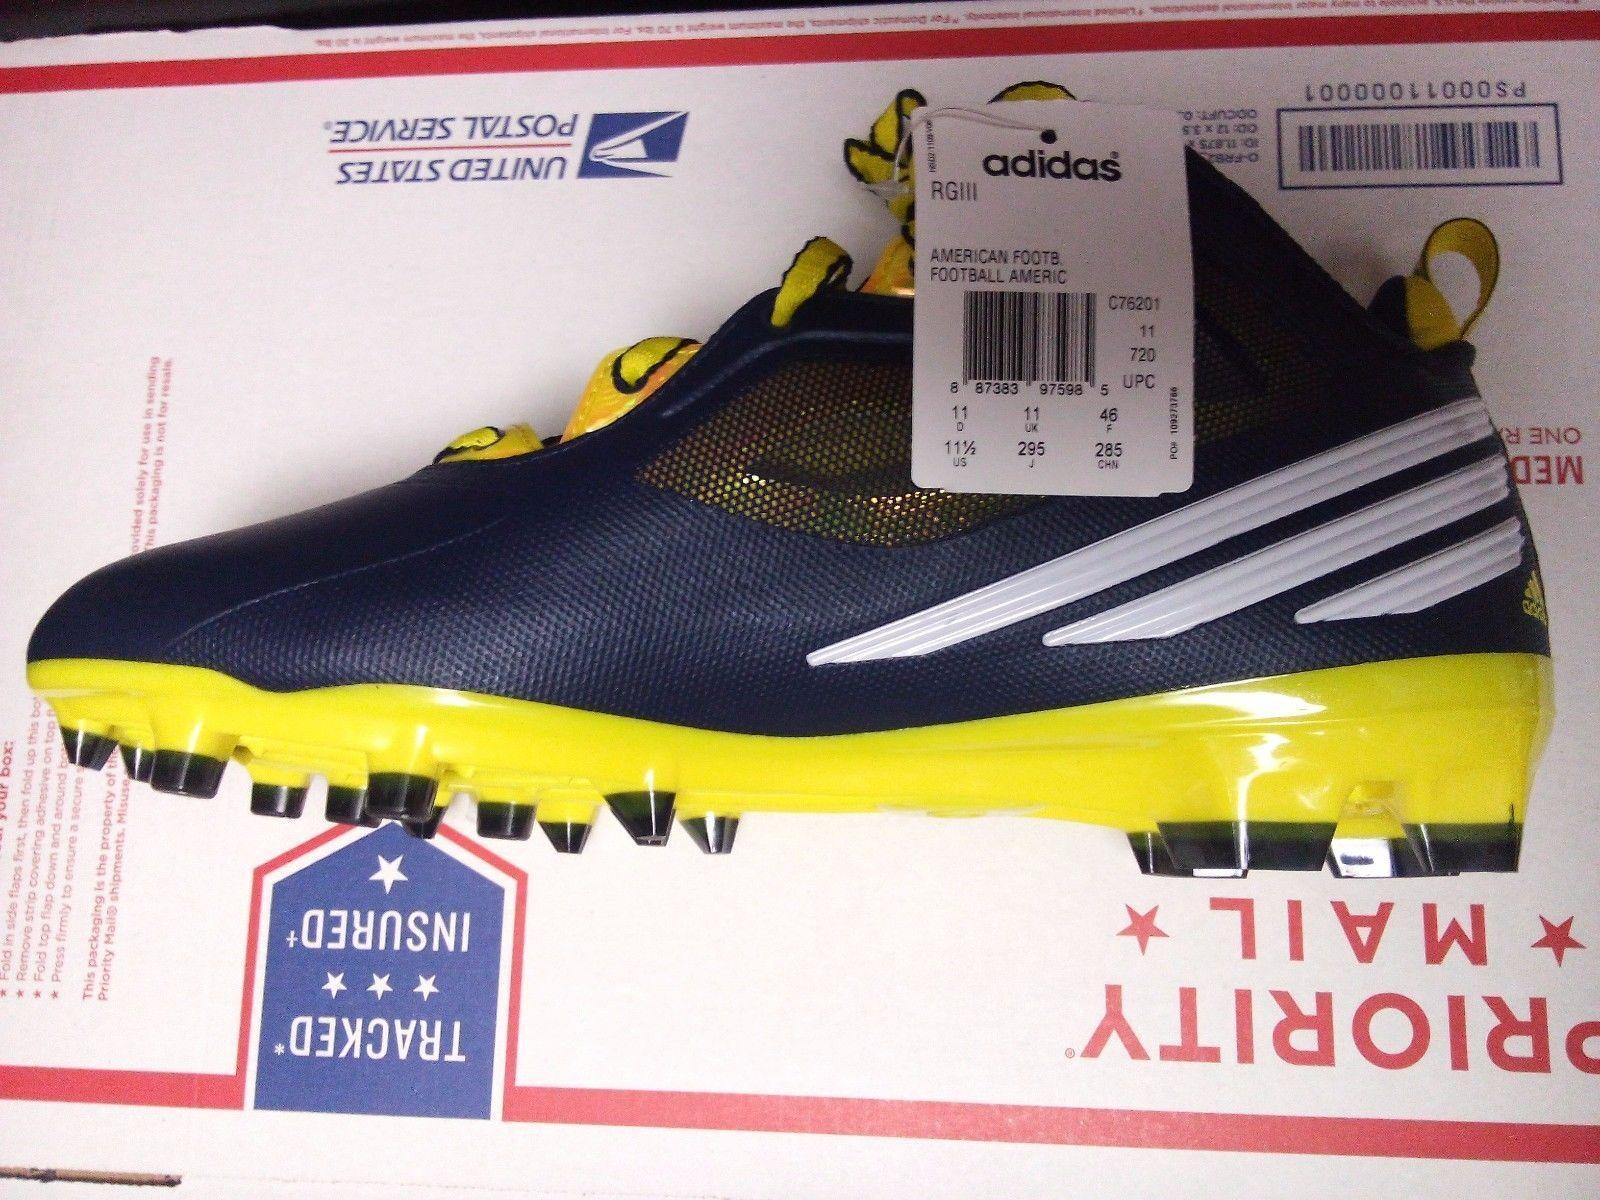 Adidas Adidas Adidas Rgiii RG3 Herren Fußball Stollenschuhe Style C76201 Msrp 11c92f